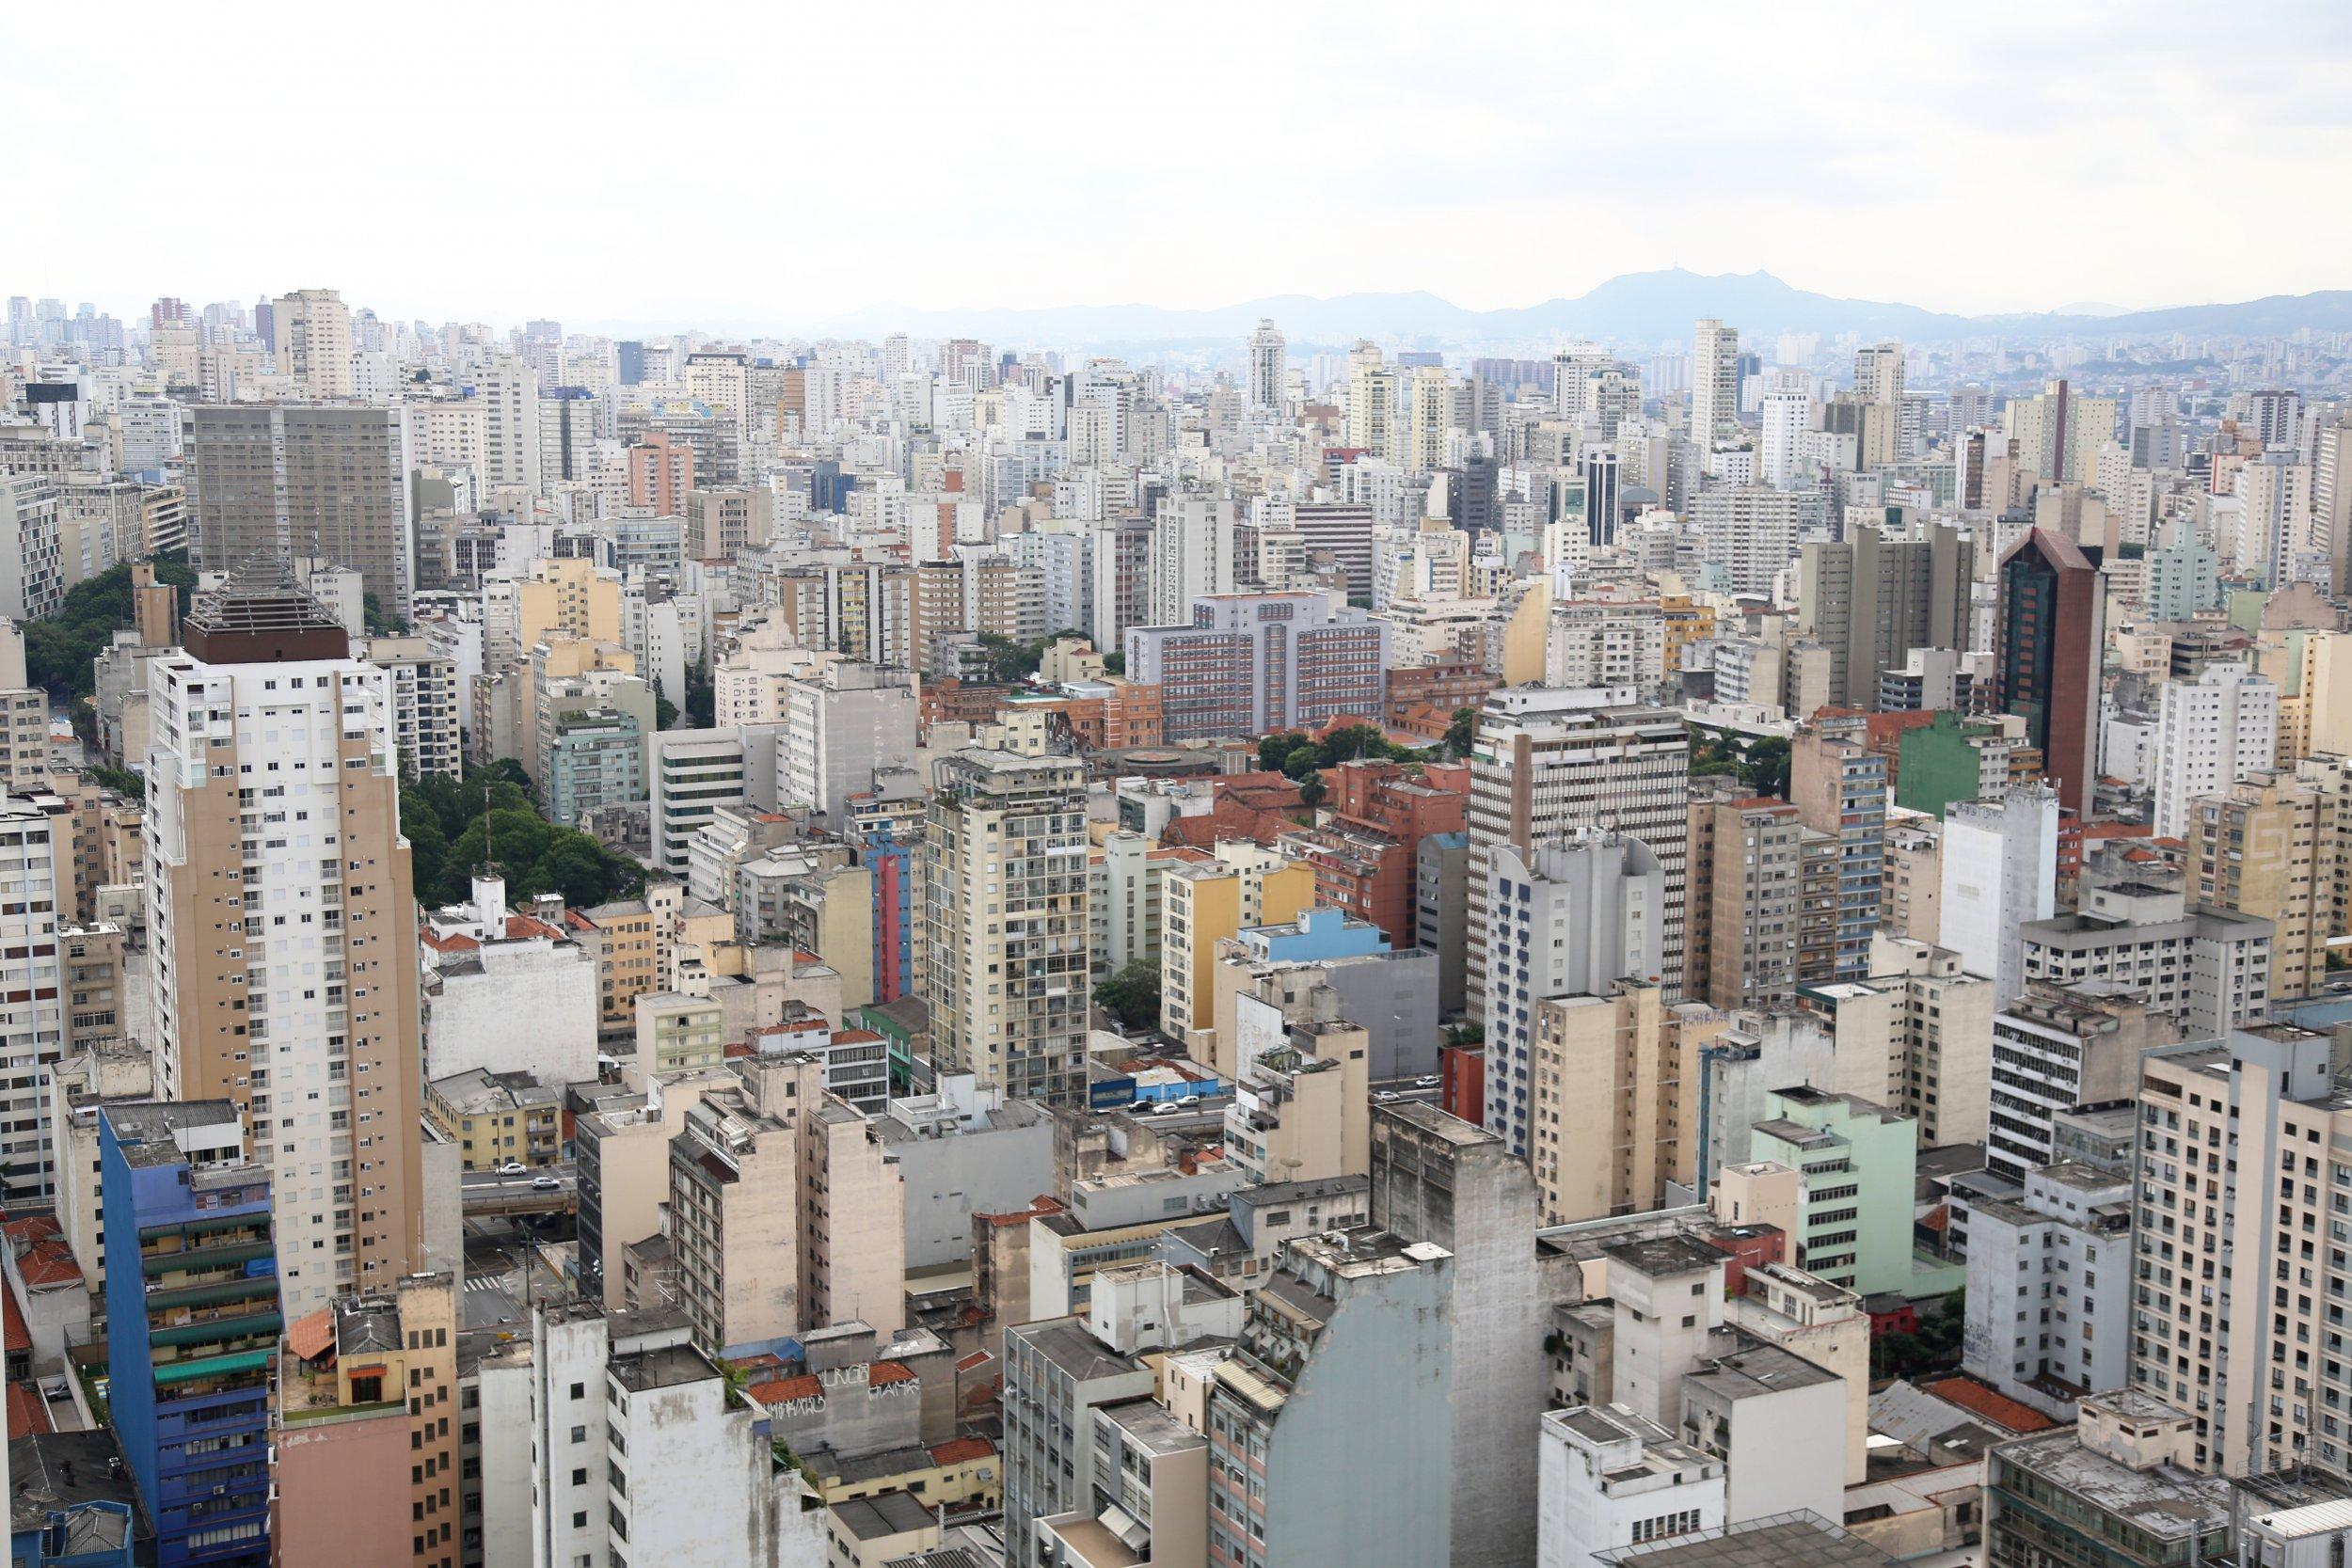 02 Sao Paulo